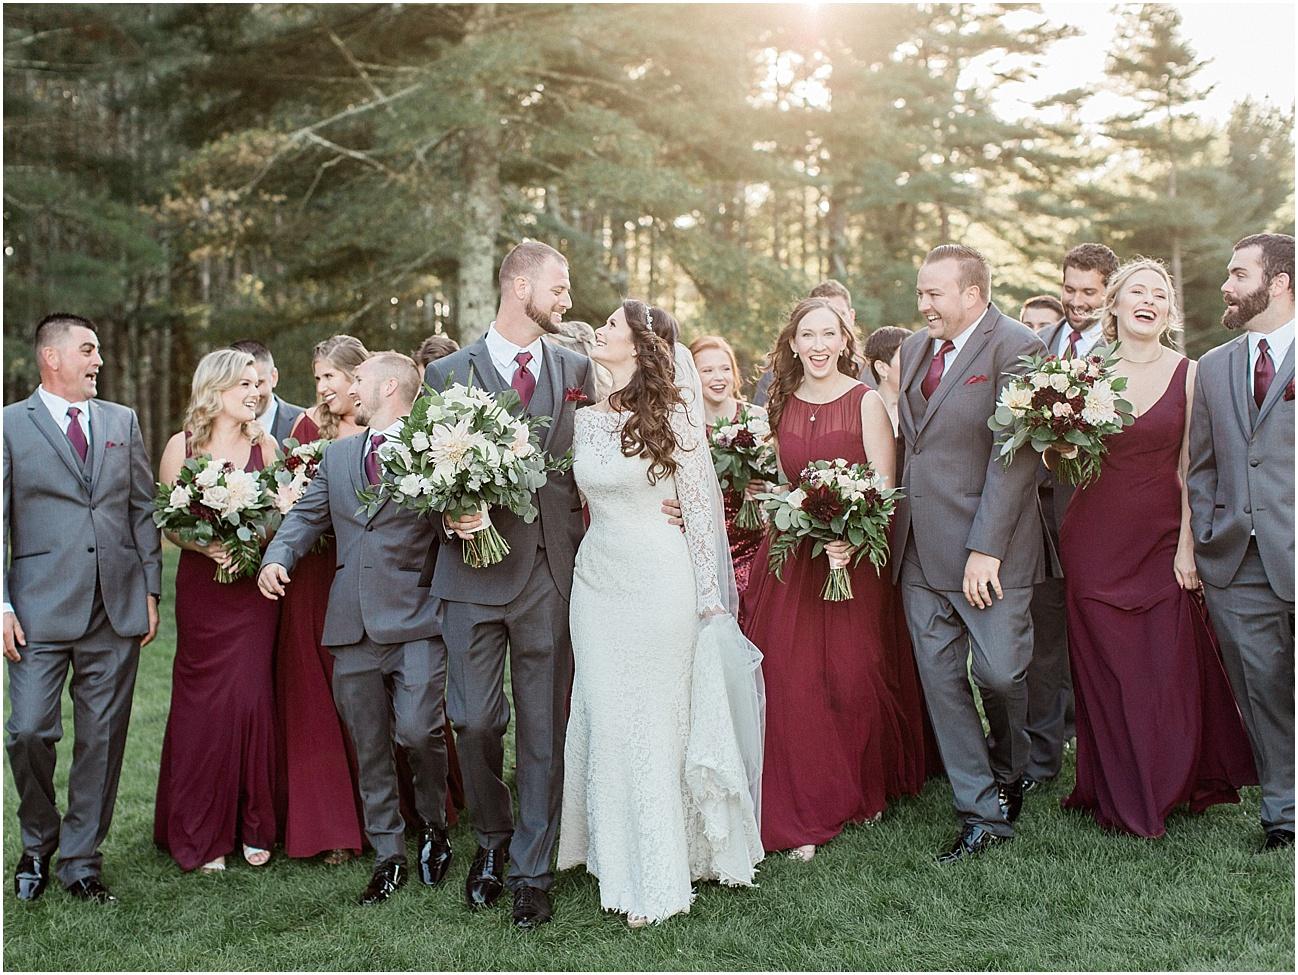 christina_frank_the_pavilion_at_pine_hills_fall_wine_cape_cod_boston_wedding_photographer_meredith_jane_photography_photo_1242.jpg